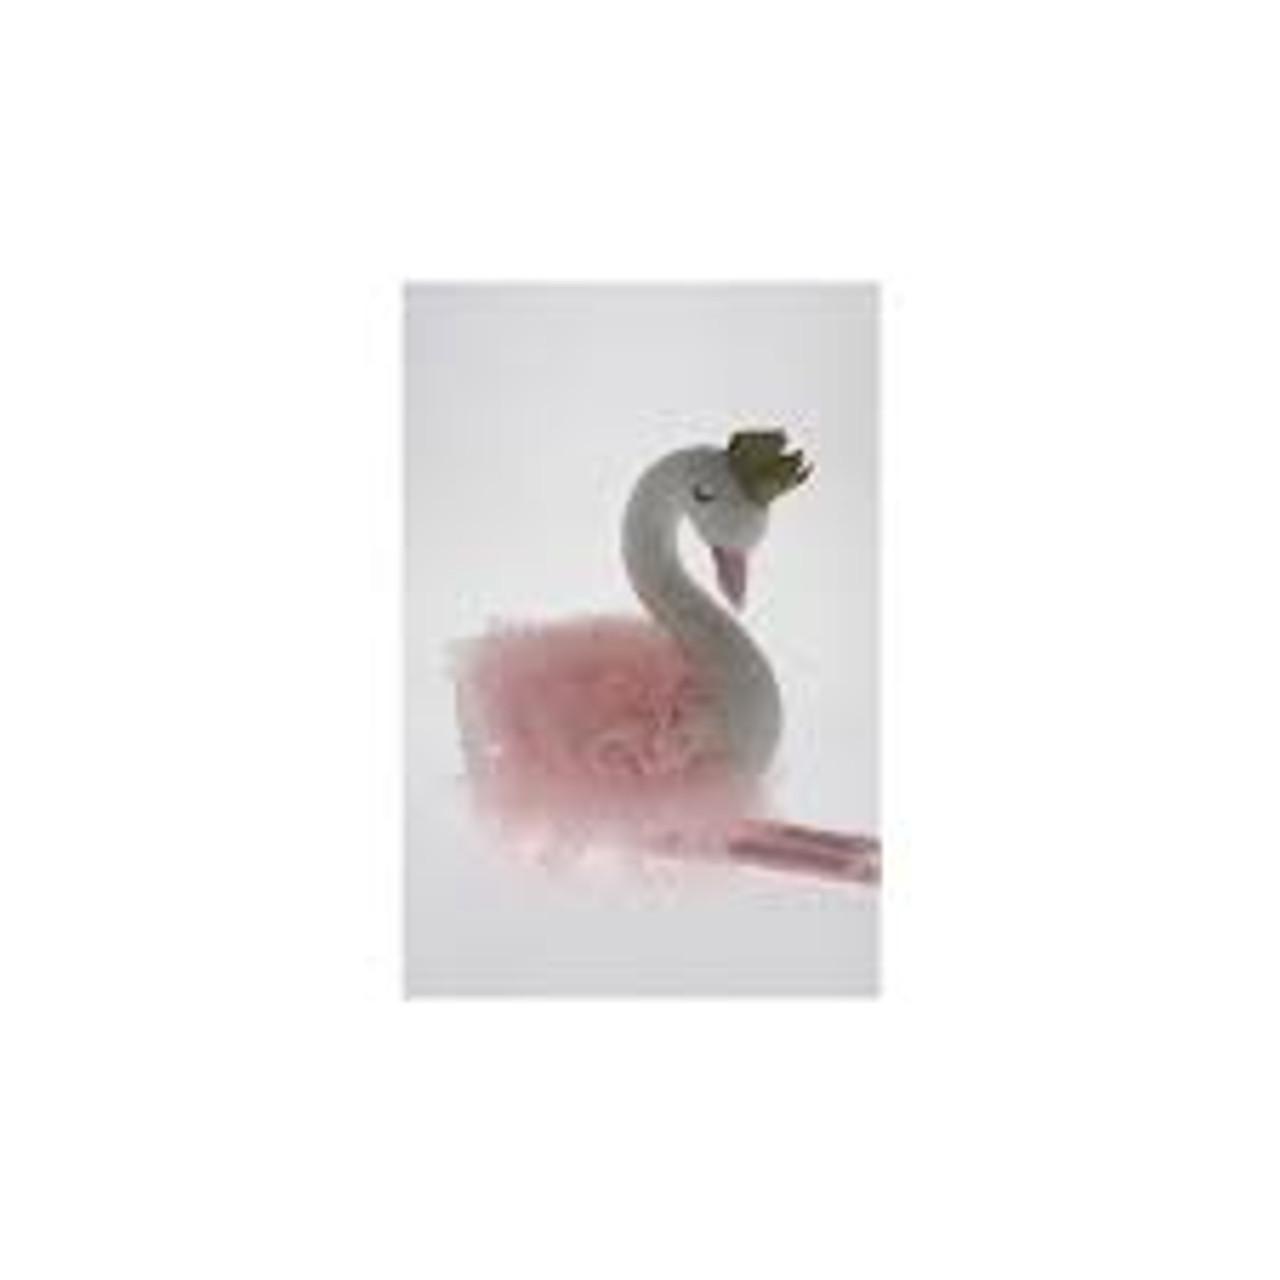 RR11 20cm Swan Ballerina Plush